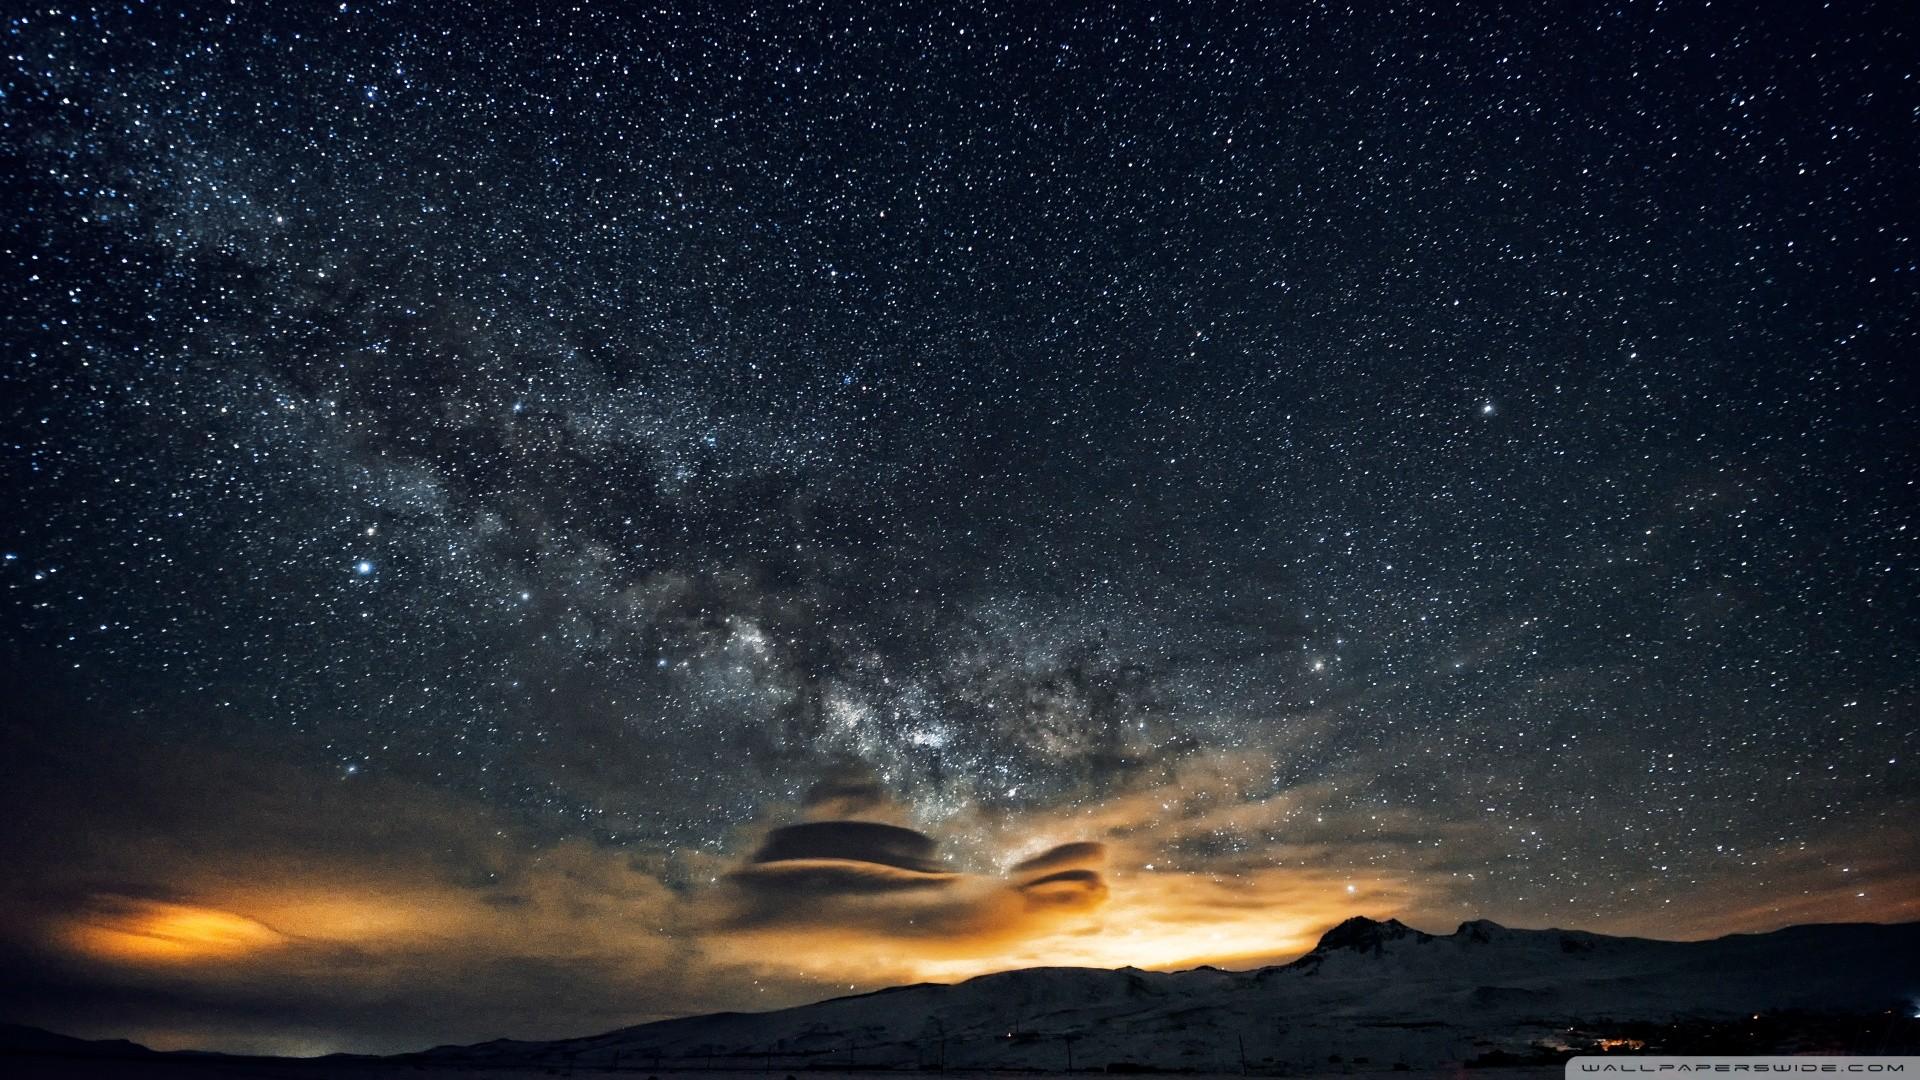 Beautiful night sky in Armenia [Wallpaper] | Reviews, news, tips, and